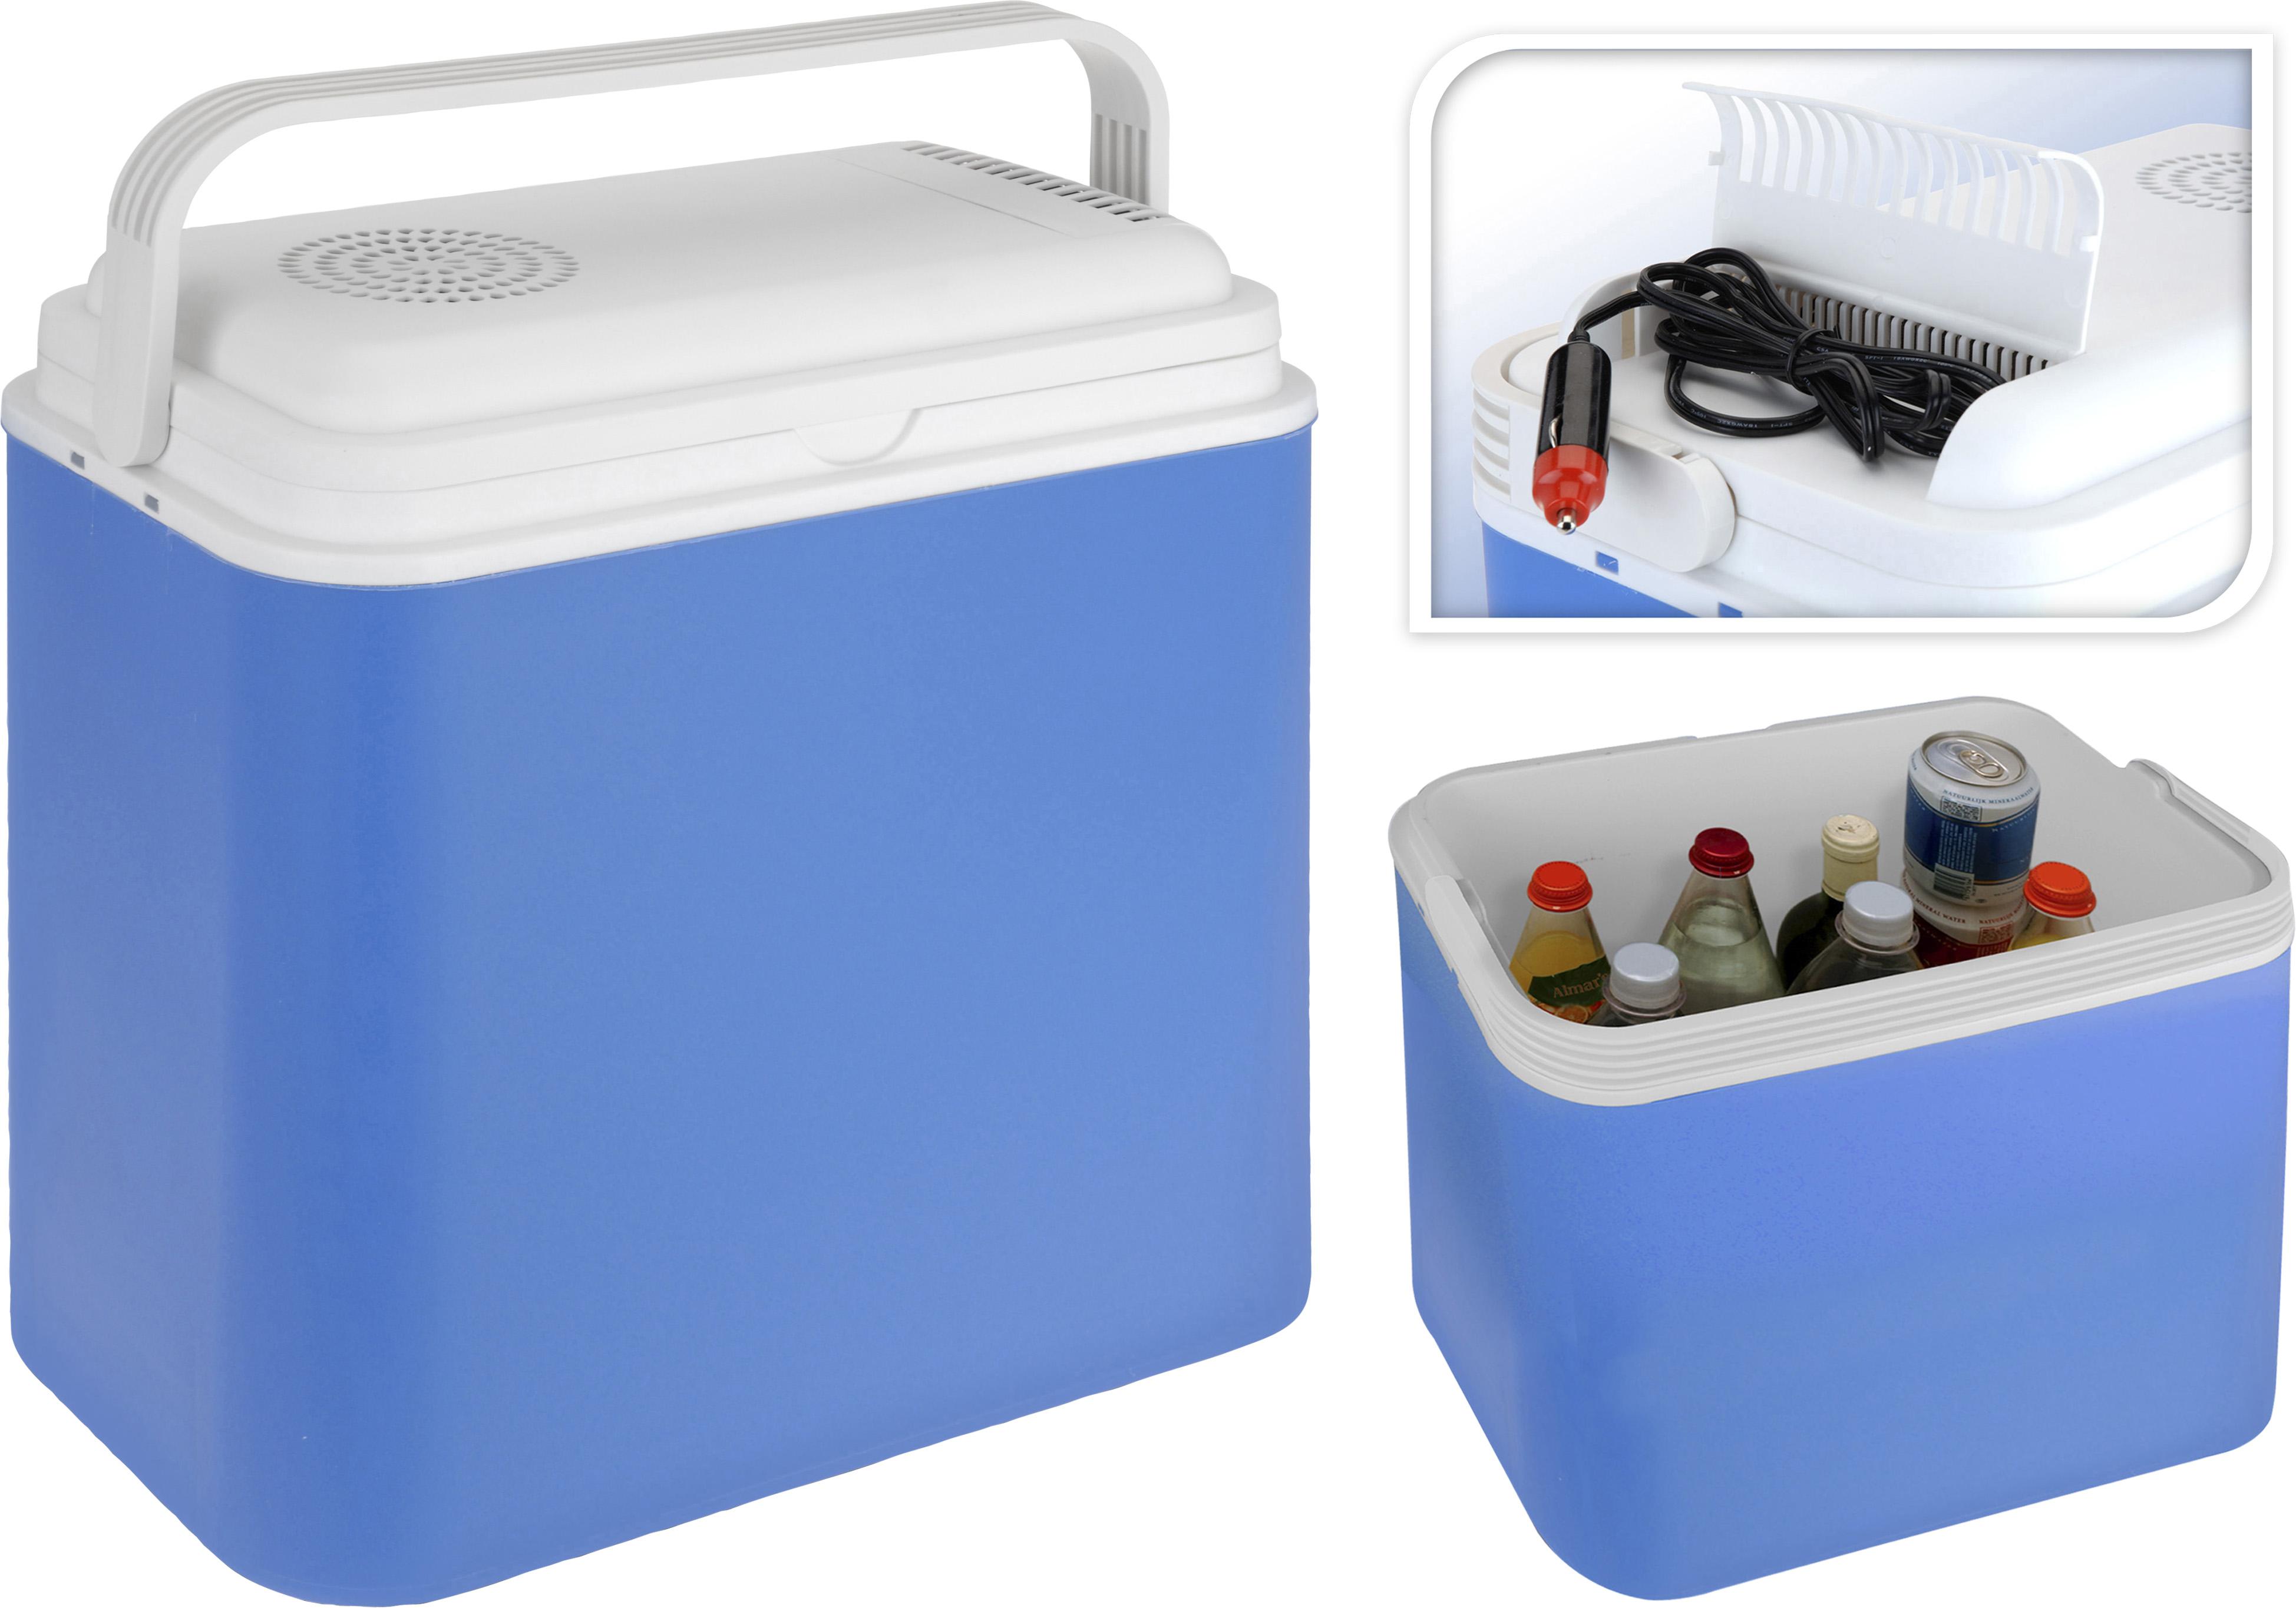 dcf071cc8ea Електрическа хладилна чанта 12V 08003966 на топ цена — Home Max   ex ...